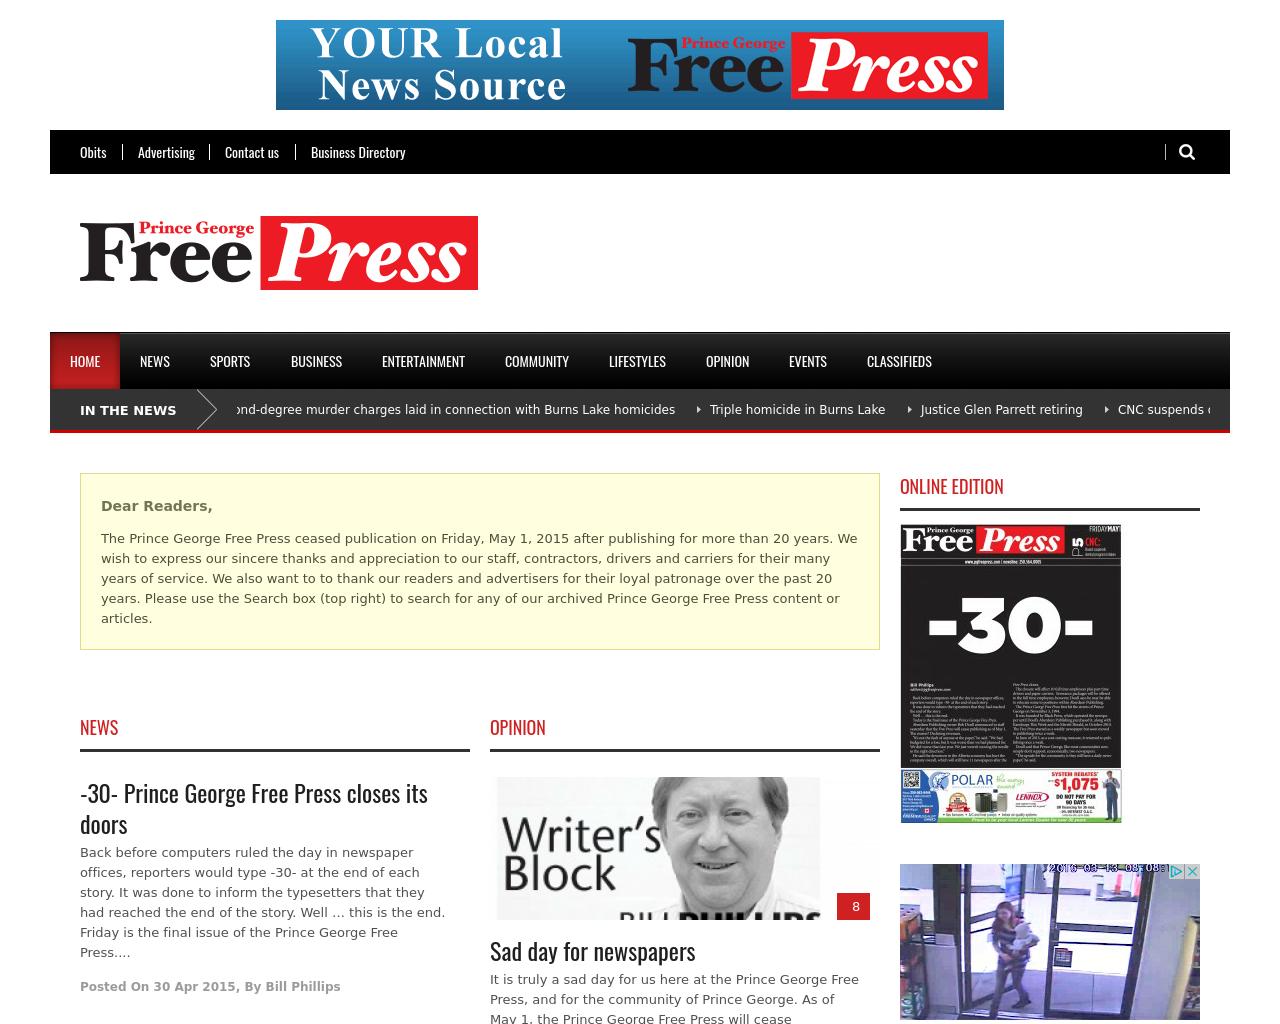 Prince-George-Free-Press-Advertising-Reviews-Pricing